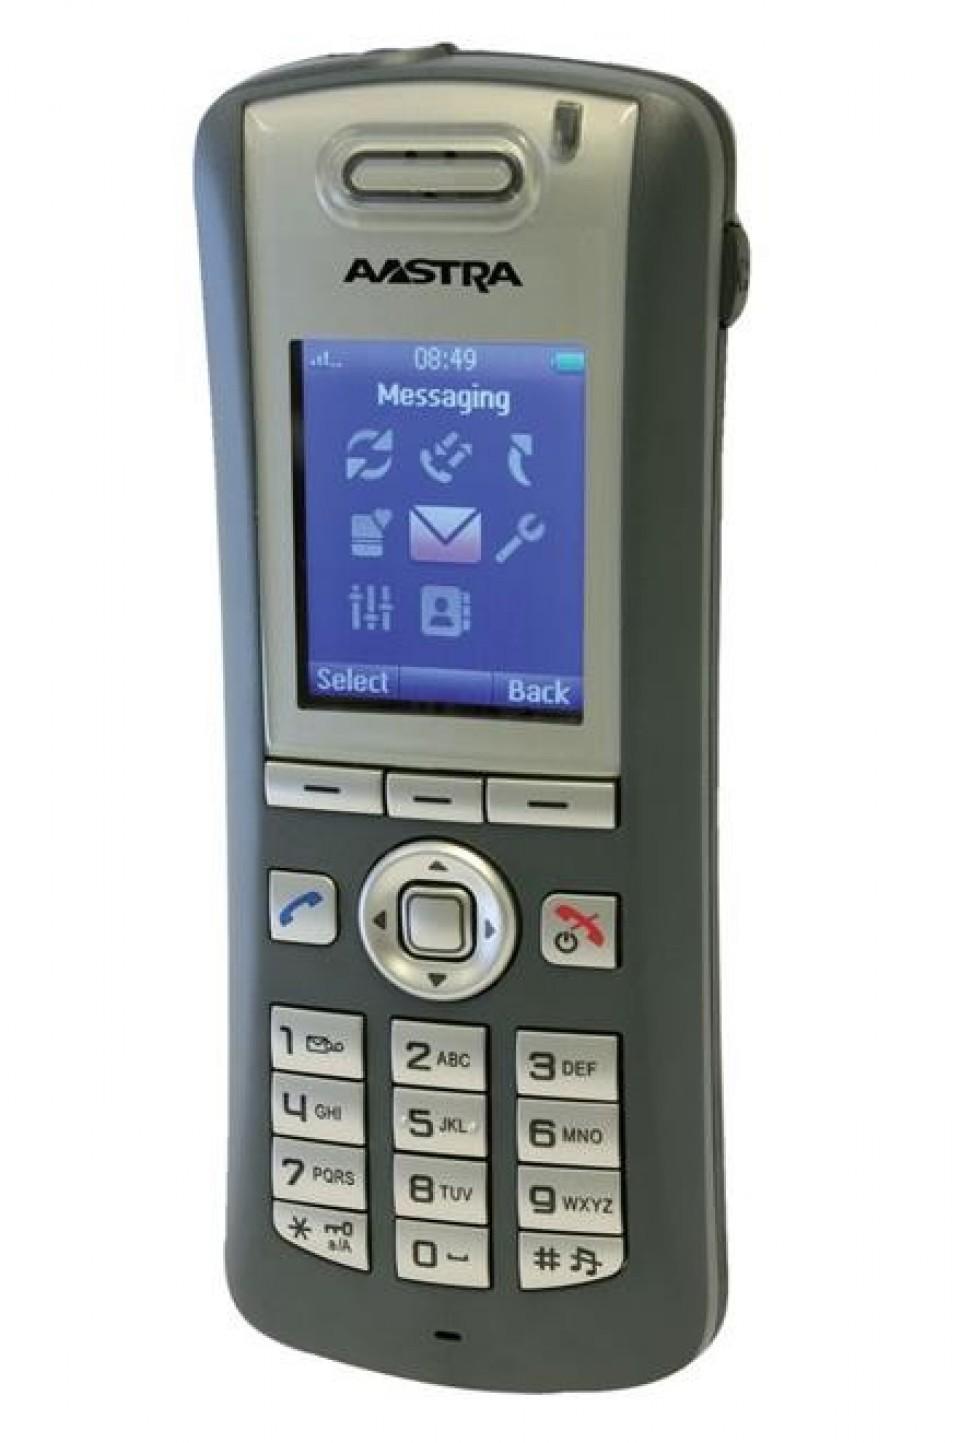 Mitel Aastra DT690 DECT Phone